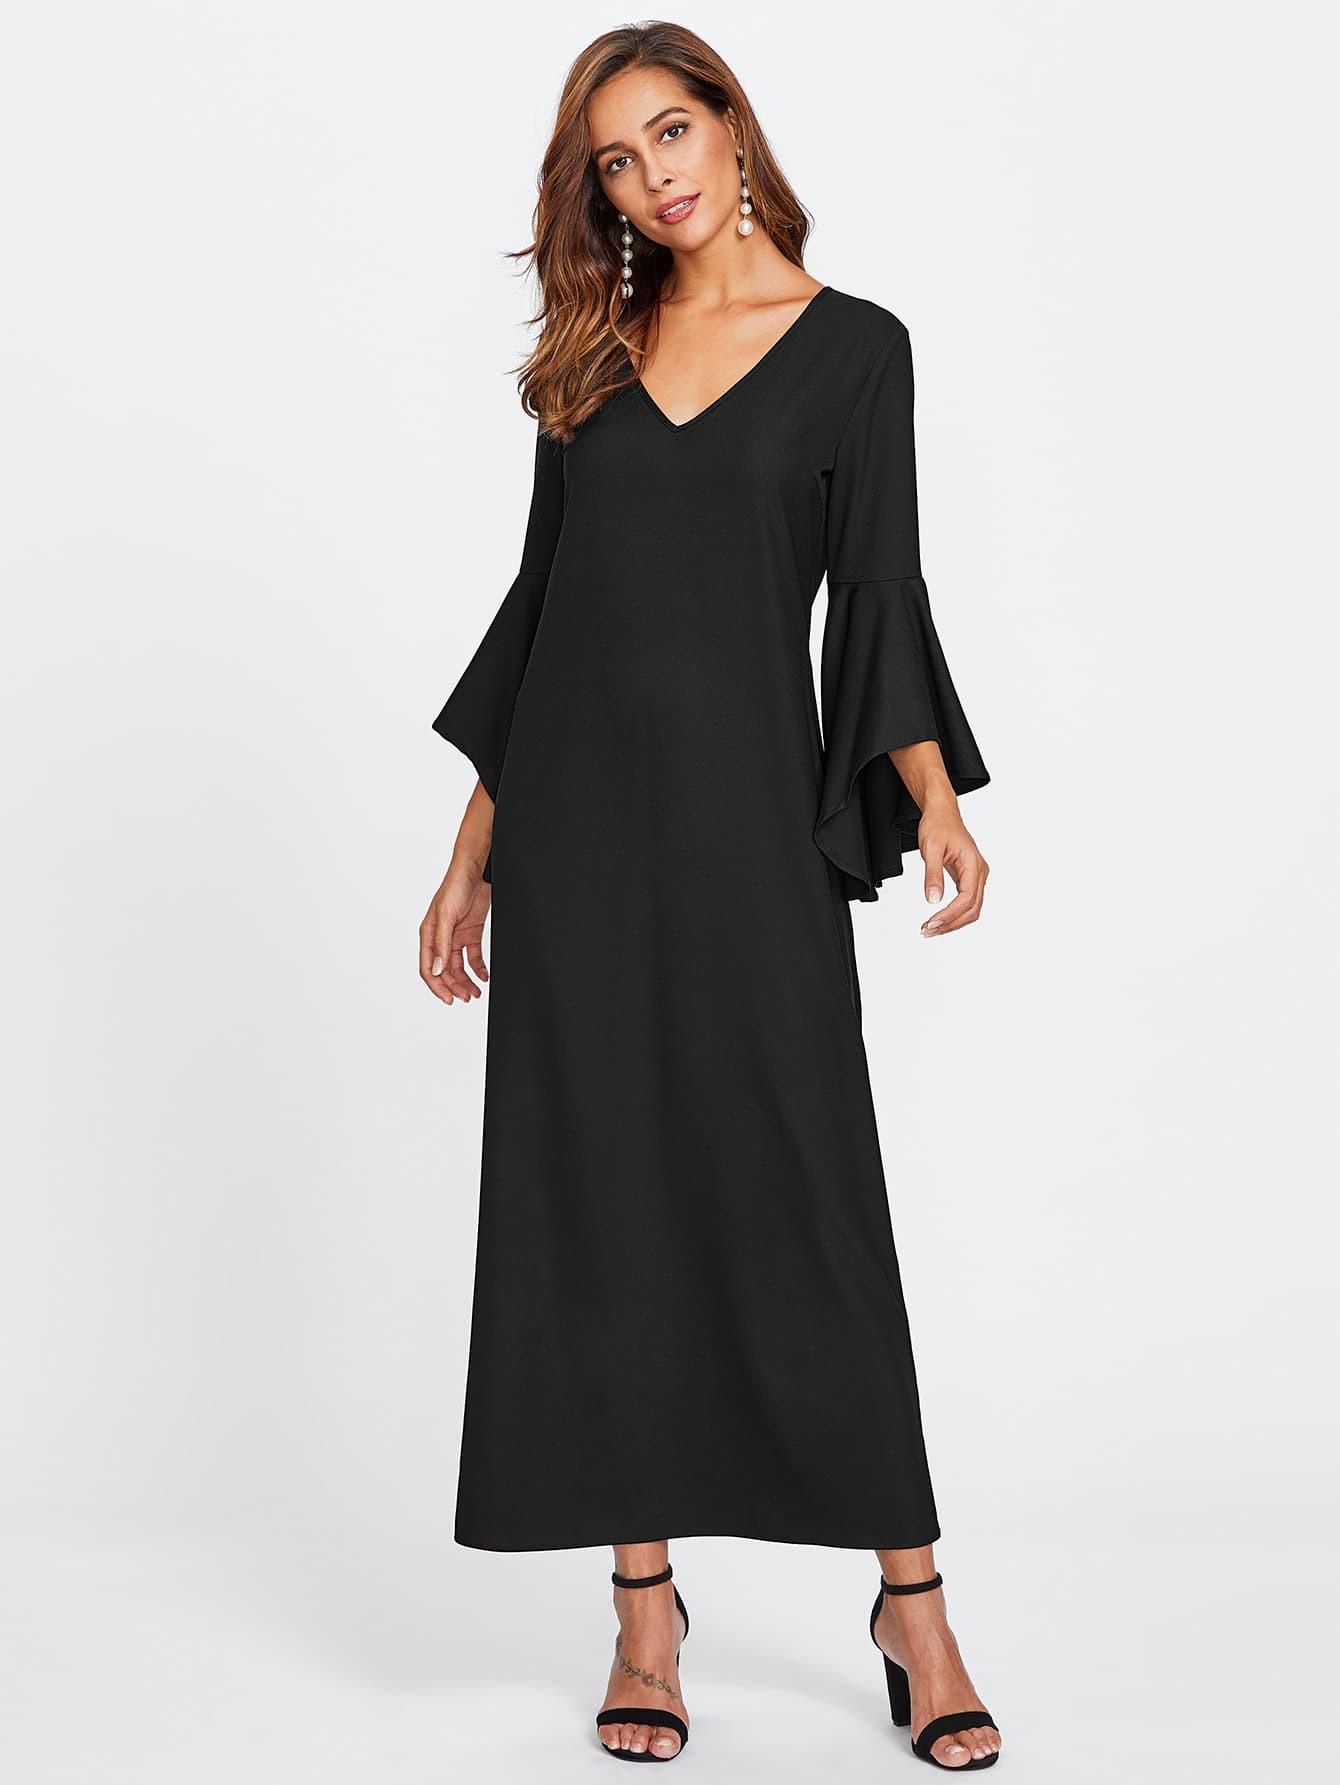 Image of Bell Sleeve Keyhole Back Hijab Evening Dress